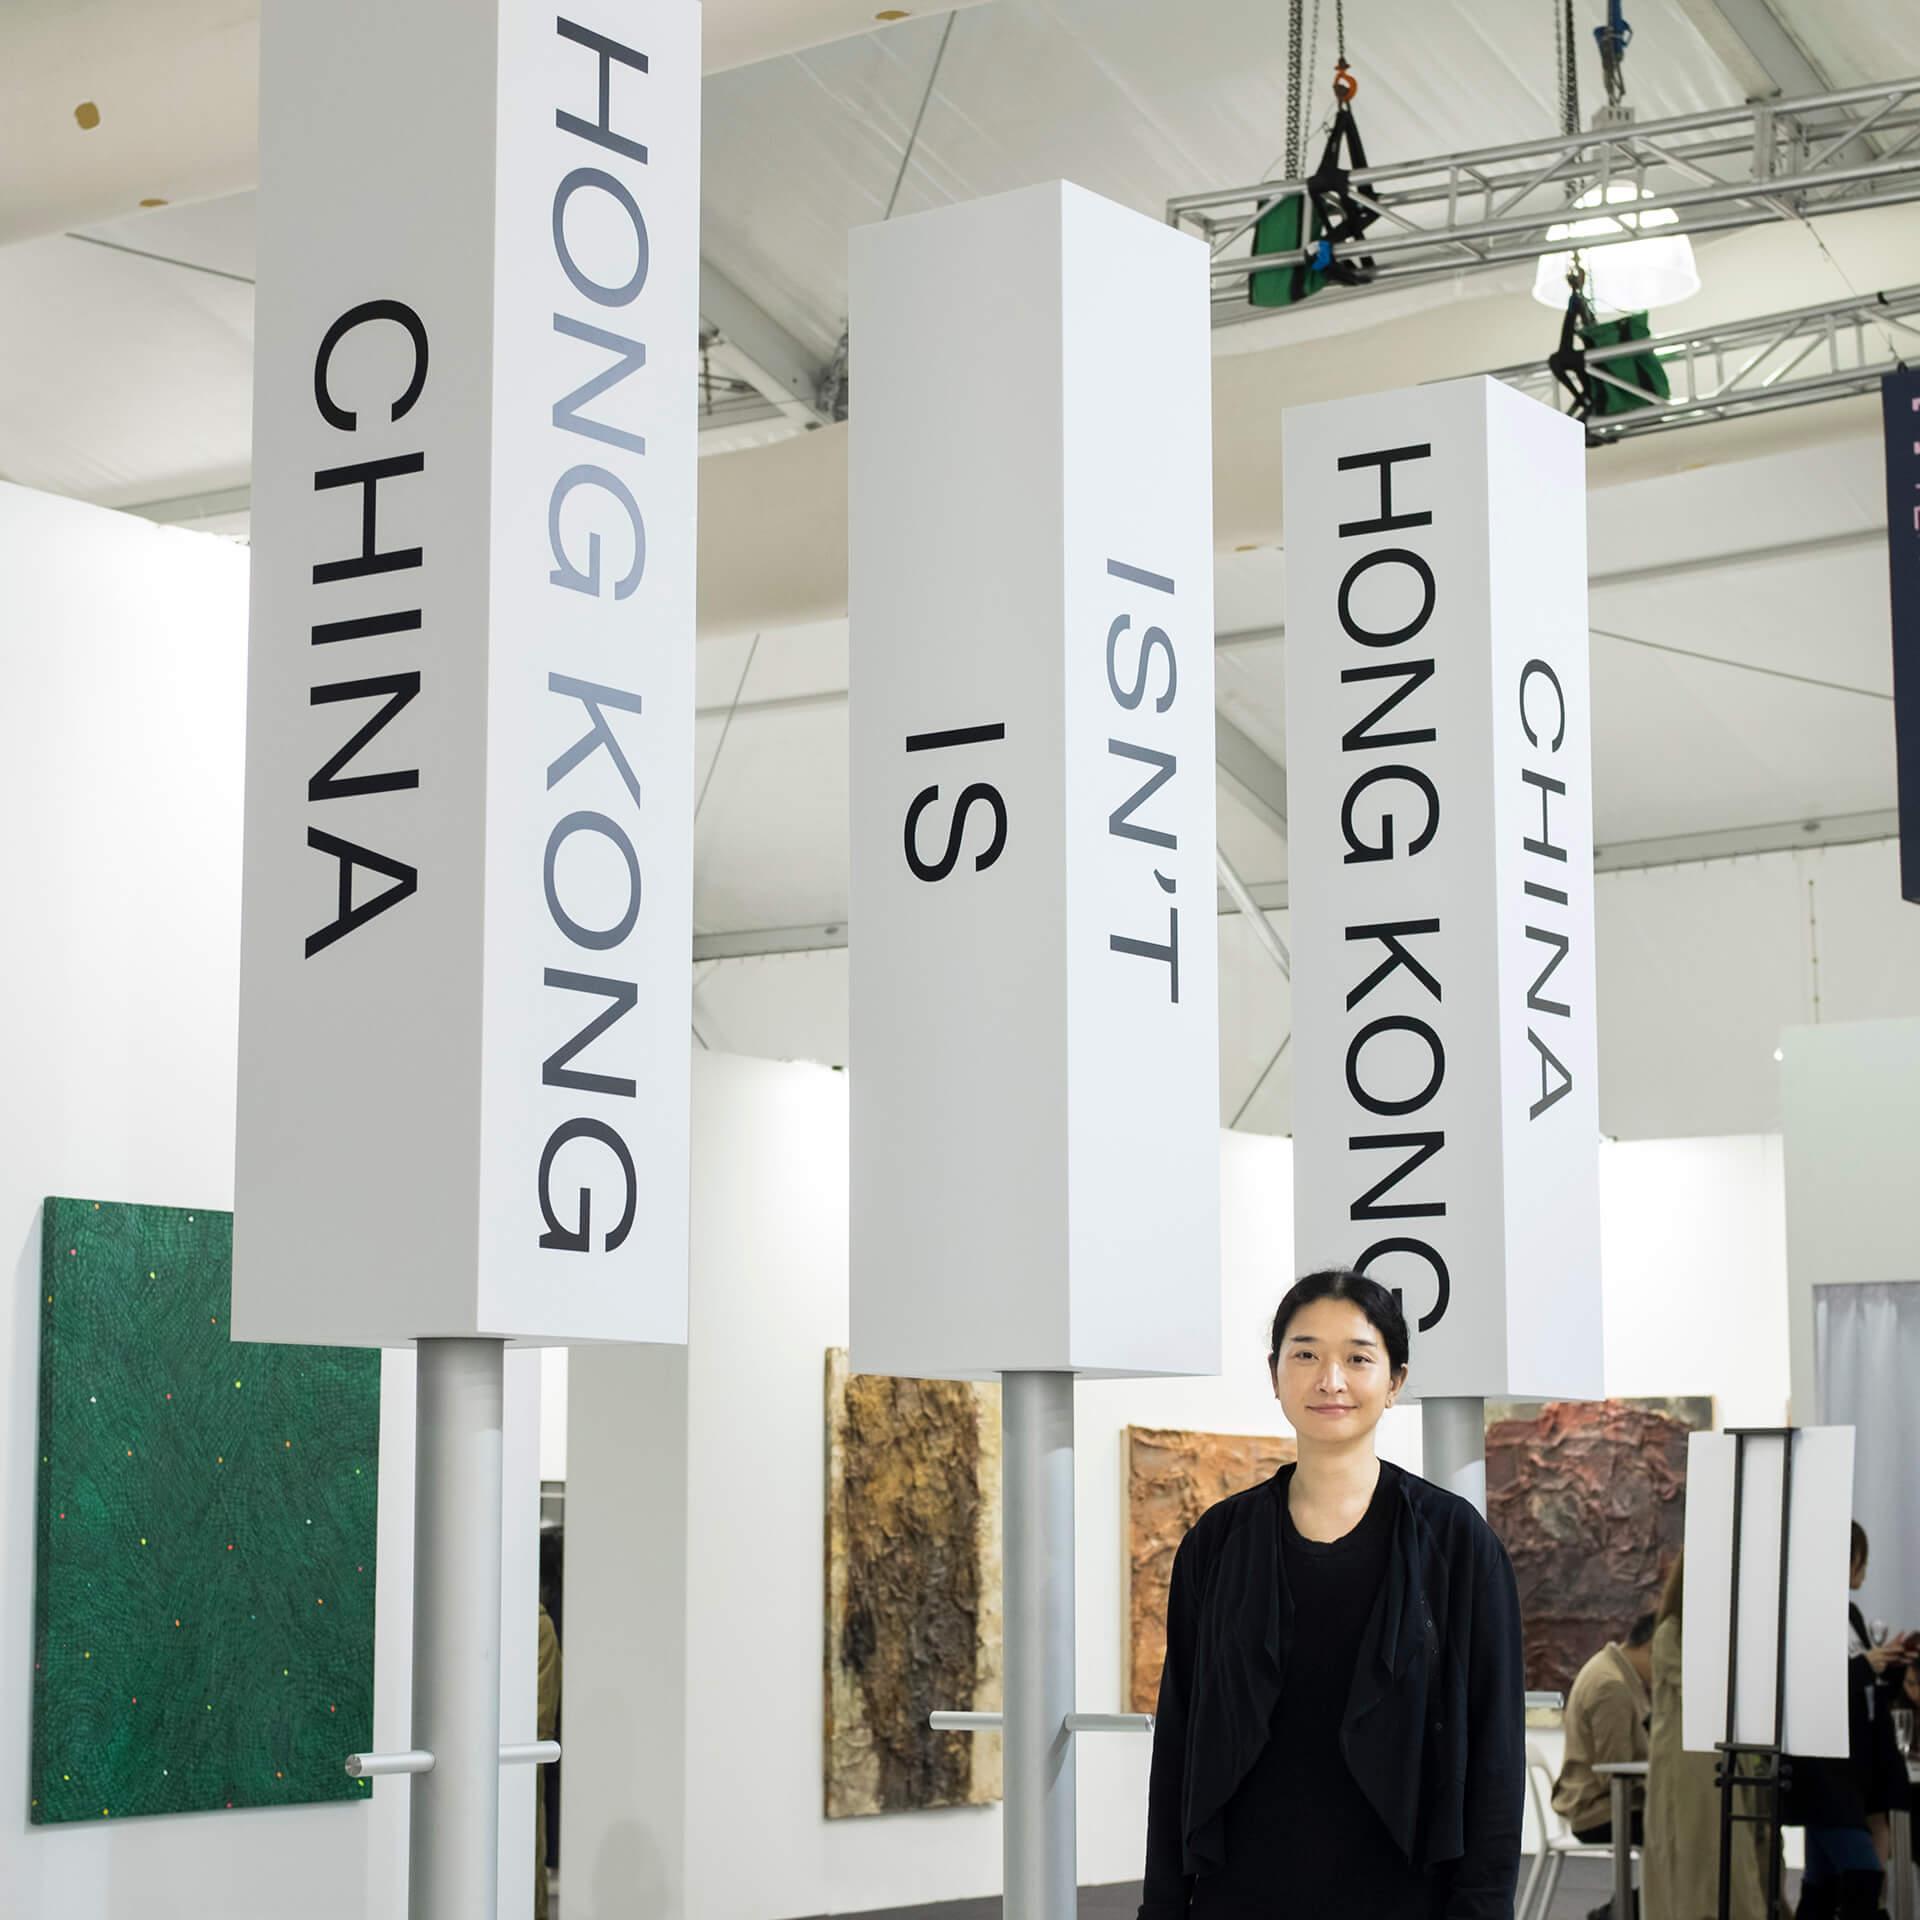 「Hong Kong is China」轉一轉就是「Hong Kong isn't China」,哪一個是標準答案?高小蘭答不到:「我也很混亂。」